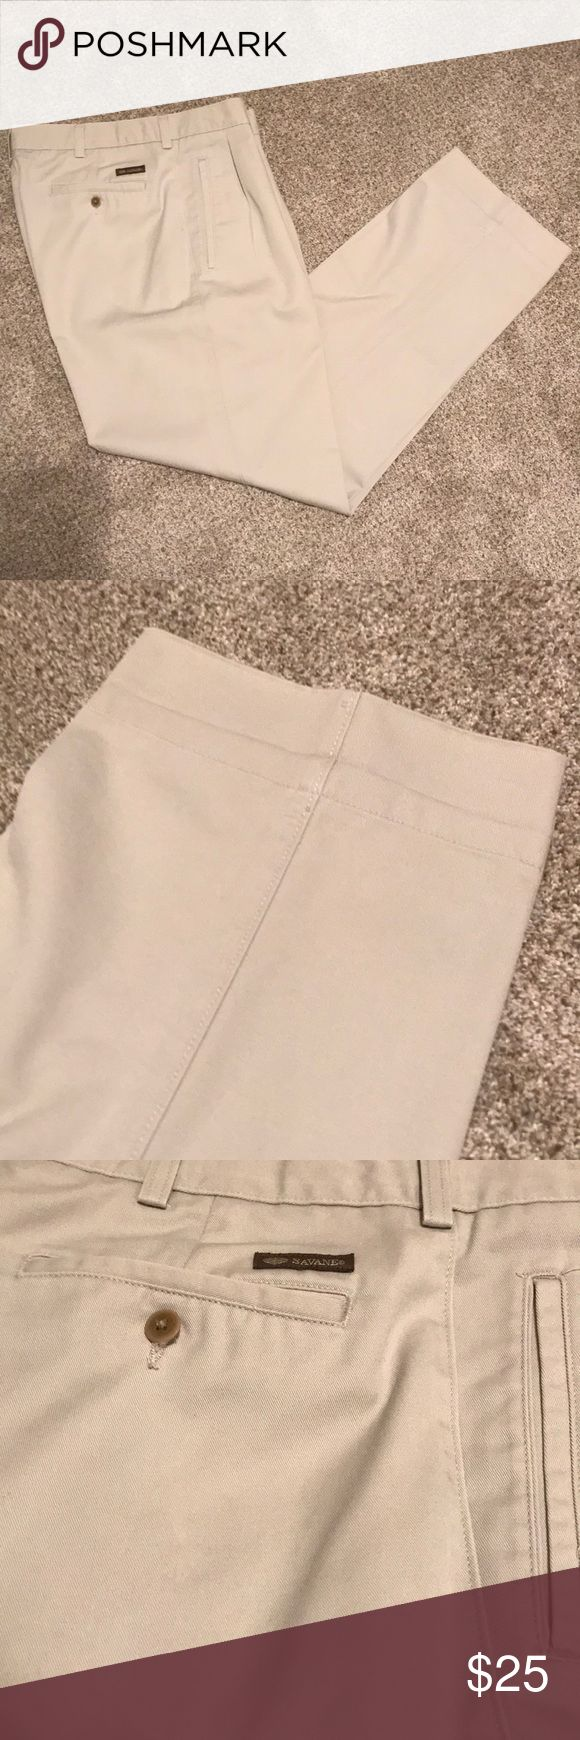 Savane men's khakis 36 x 30 Great condition as seen in photos. Savane Pants Chinos & Khakis